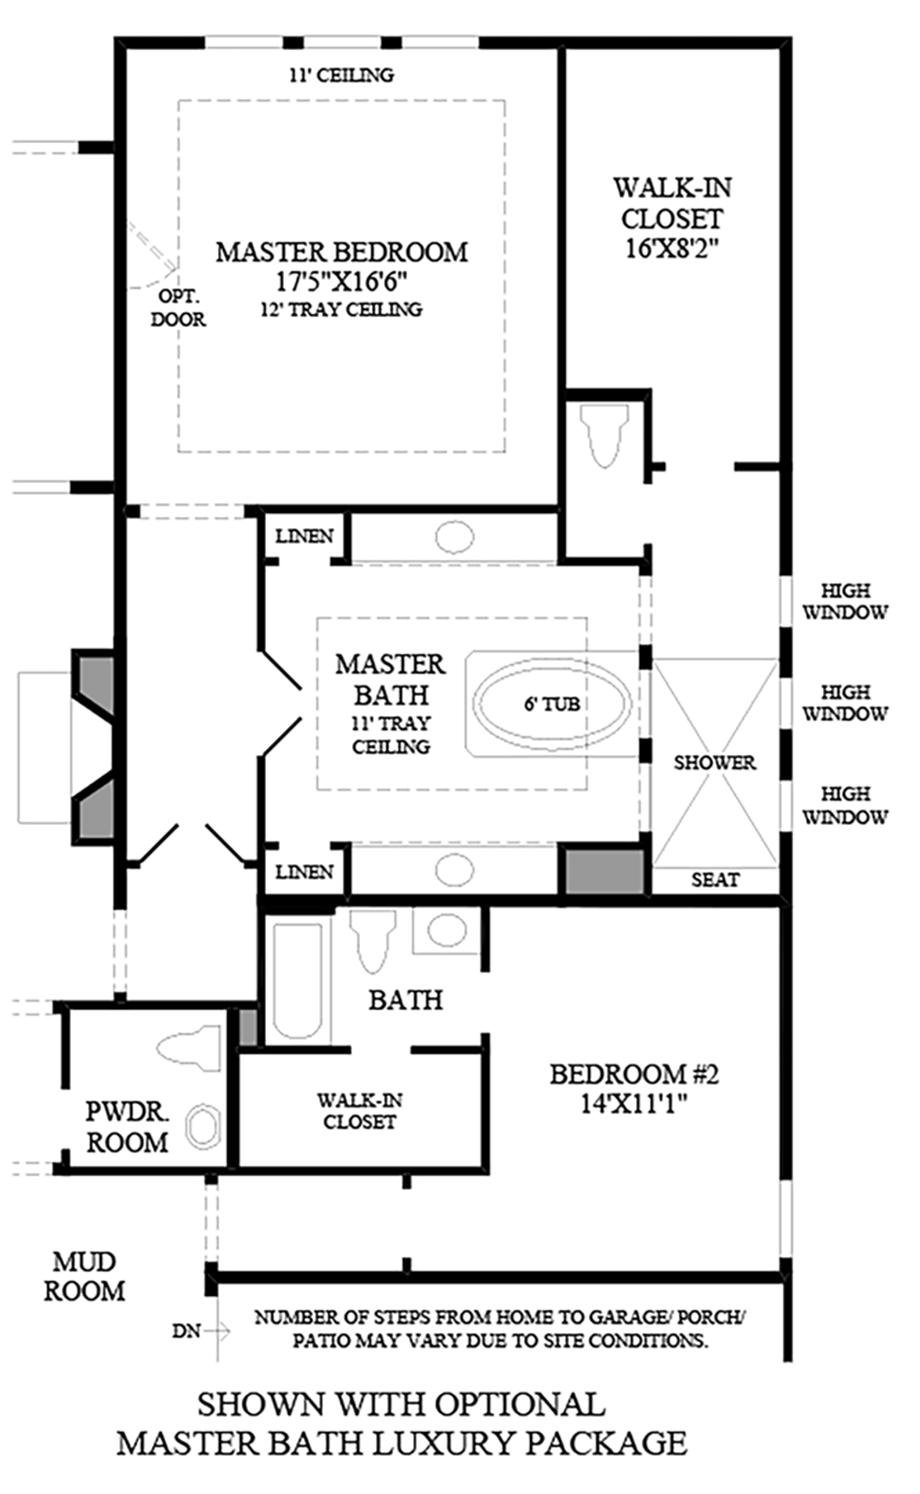 Optional Master Bath Luxury Bath Floor Plan